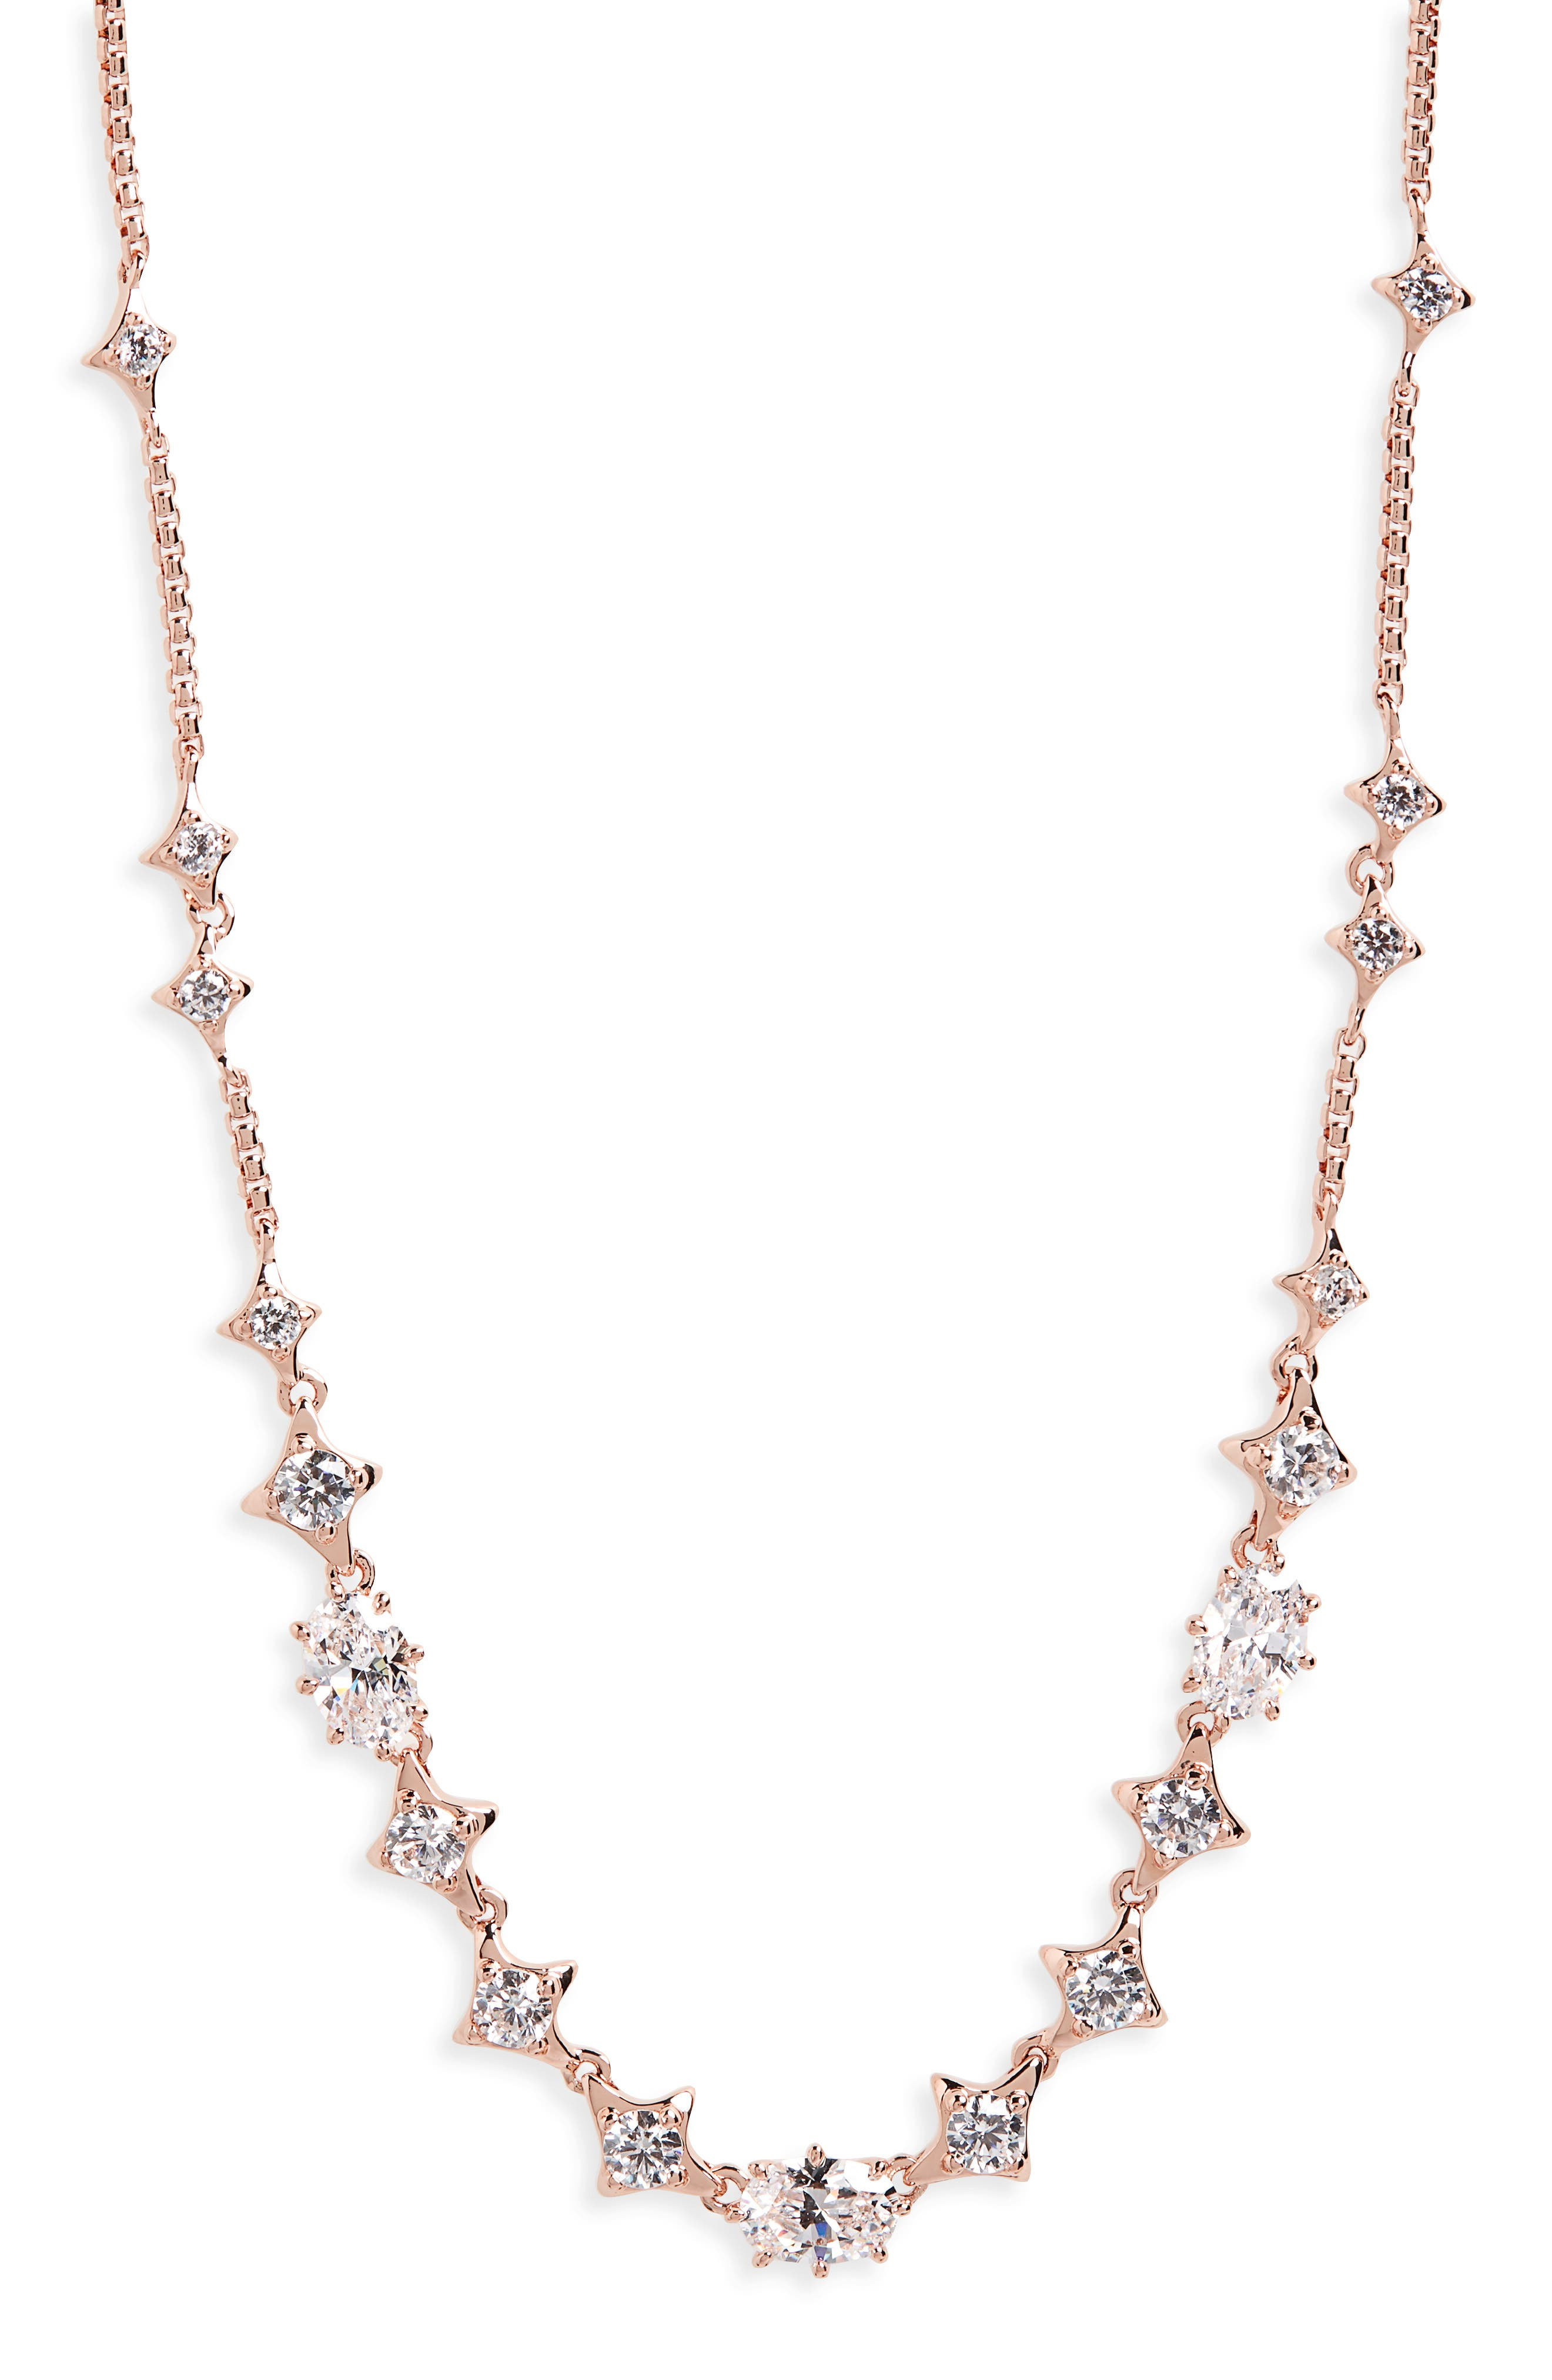 Boho Cubic Zirconia Necklace,                             Main thumbnail 2, color,